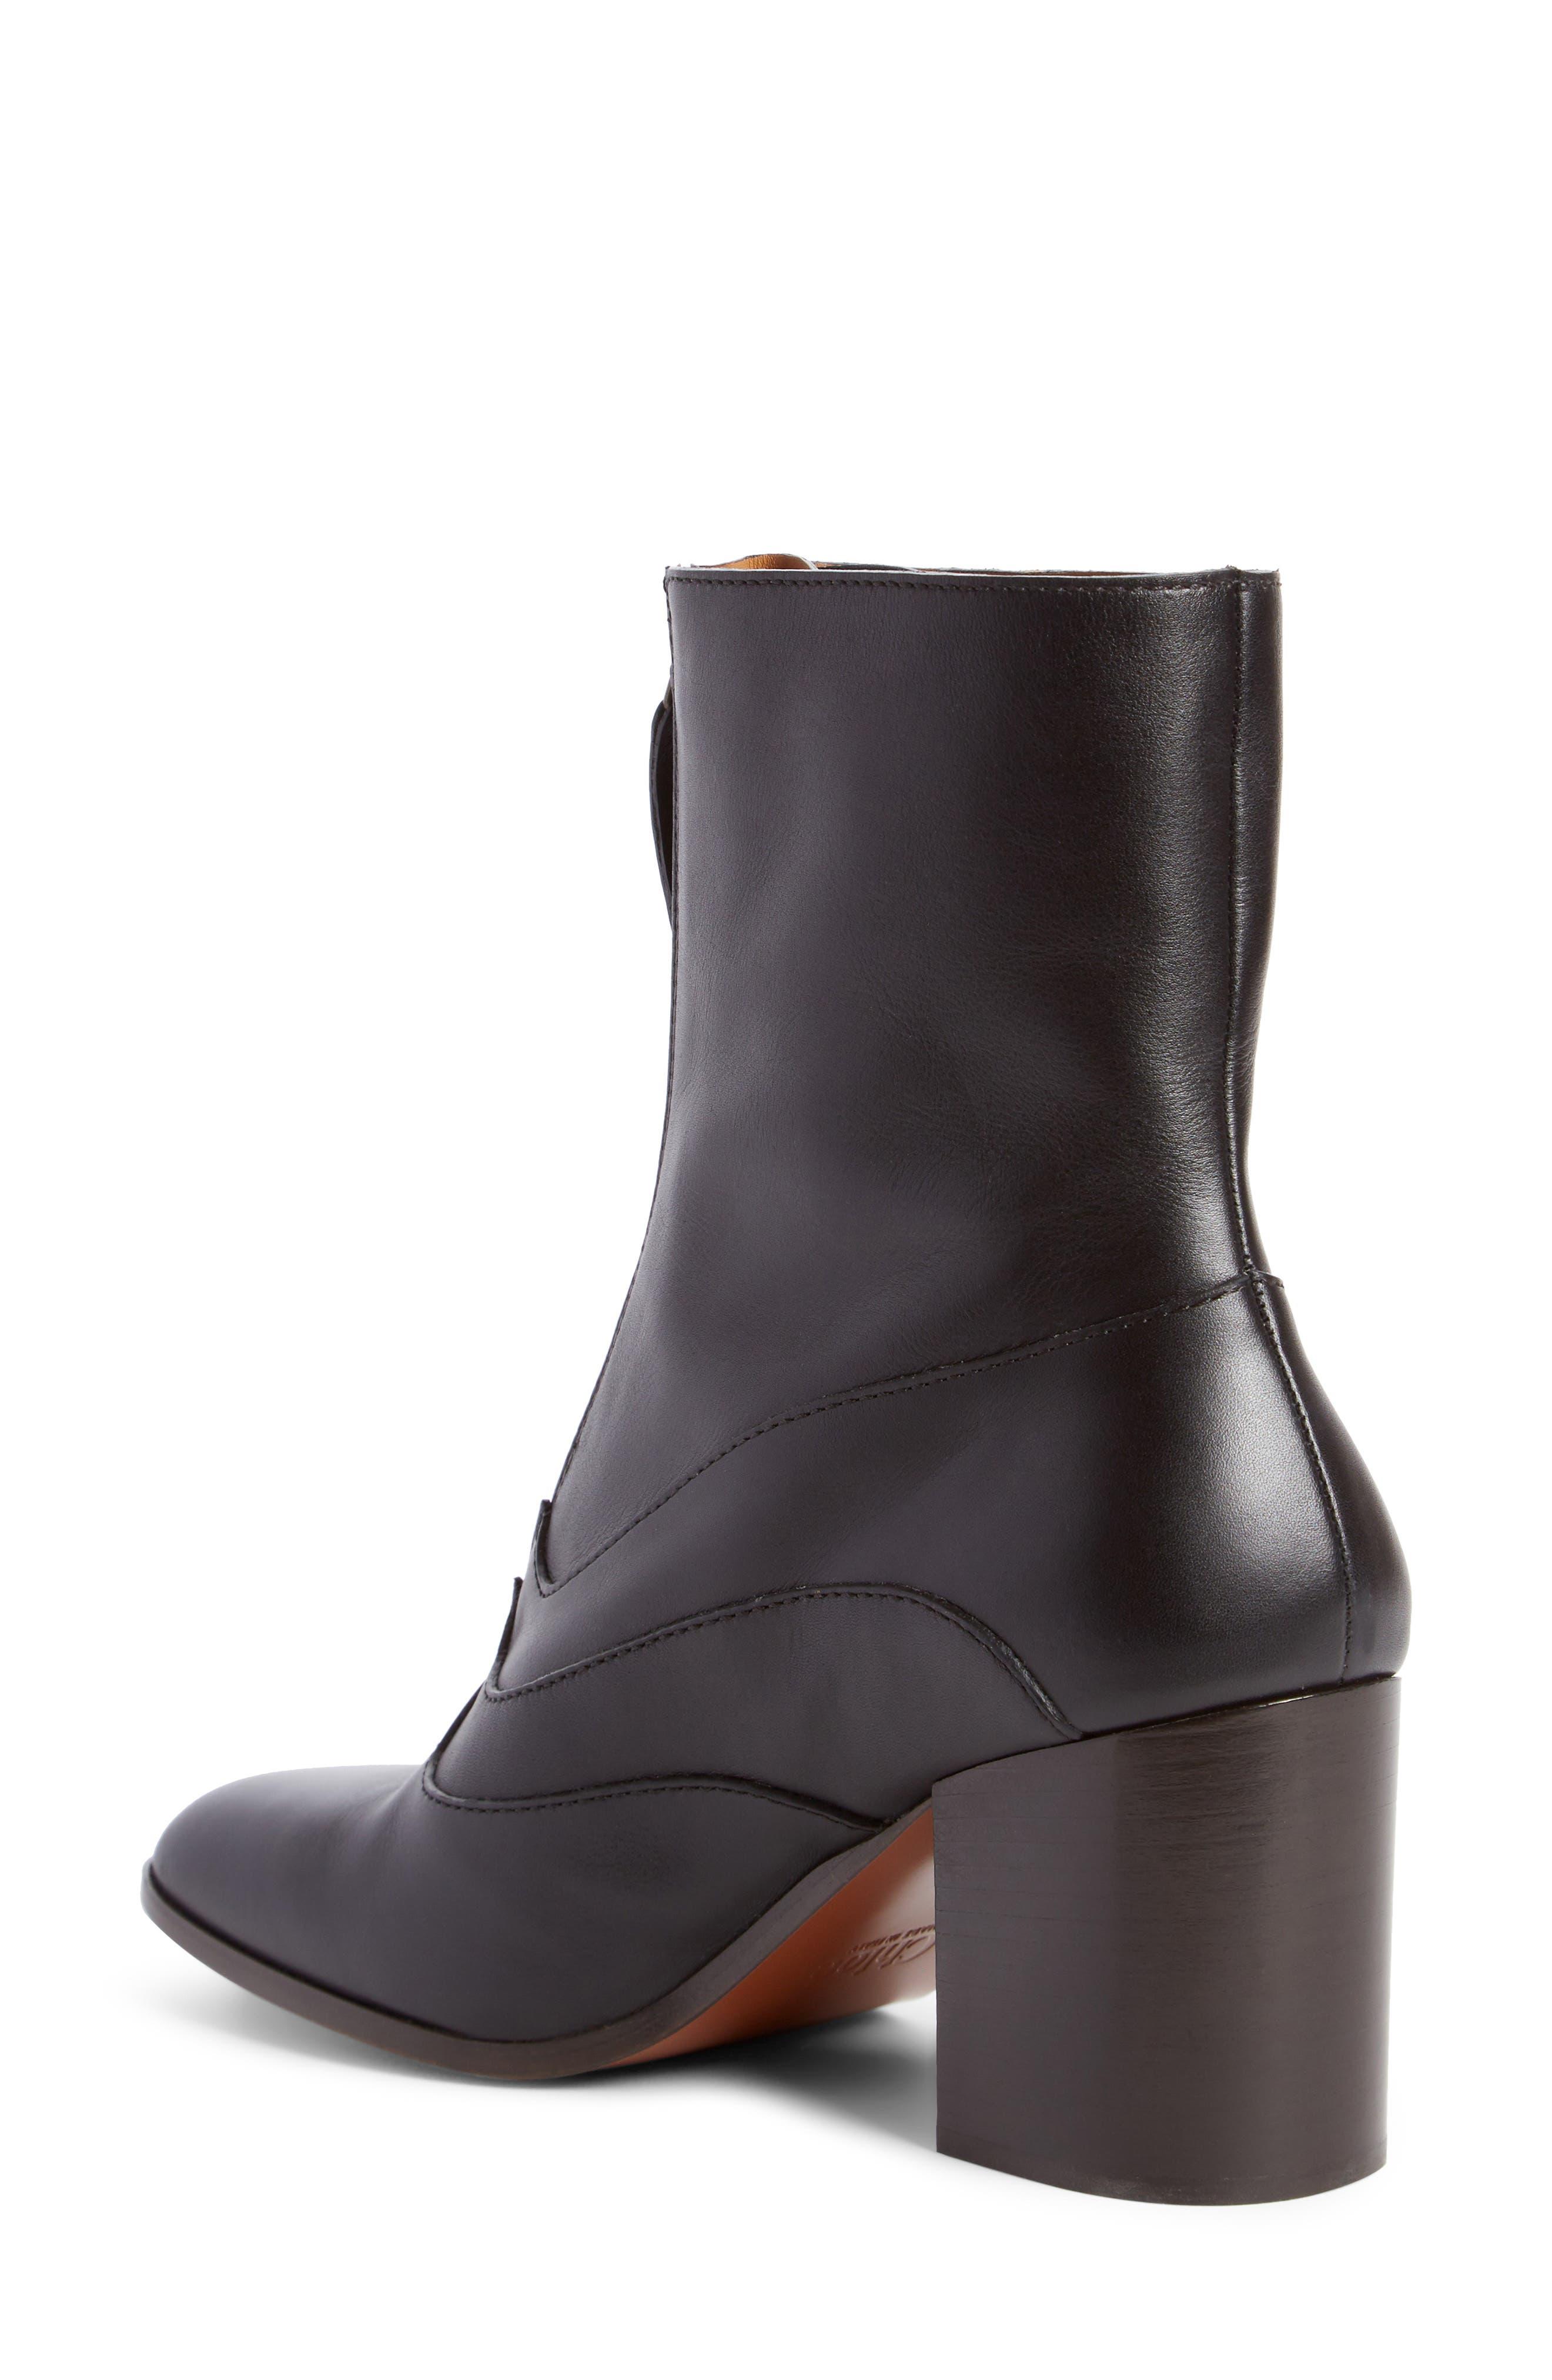 Qacey Square Toe Boot,                             Alternate thumbnail 2, color,                             Black